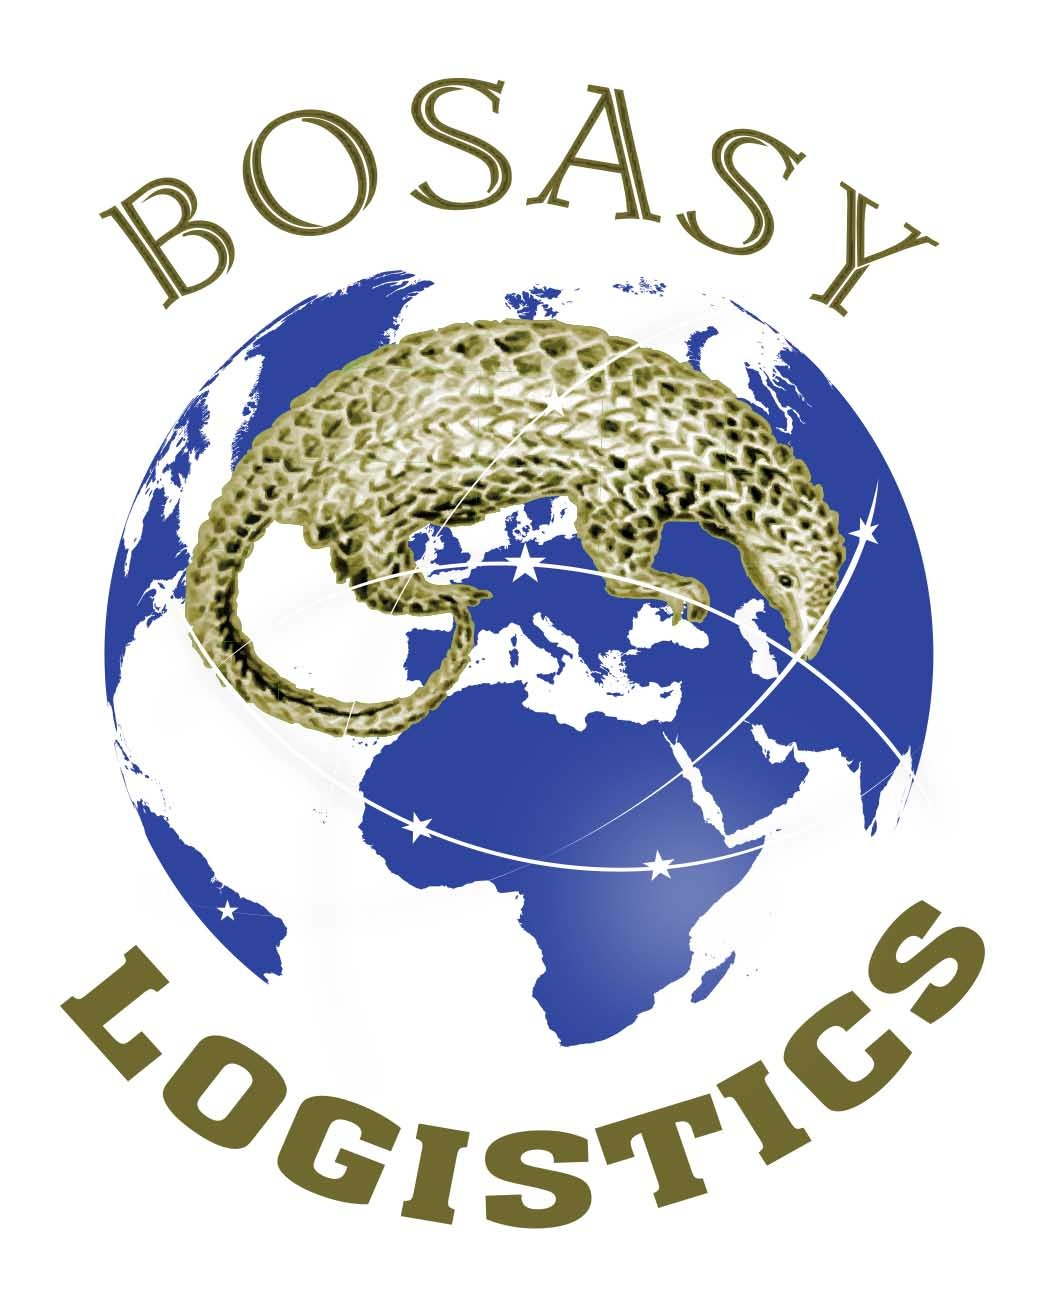 BOSASY LOGISTICS LIMITED